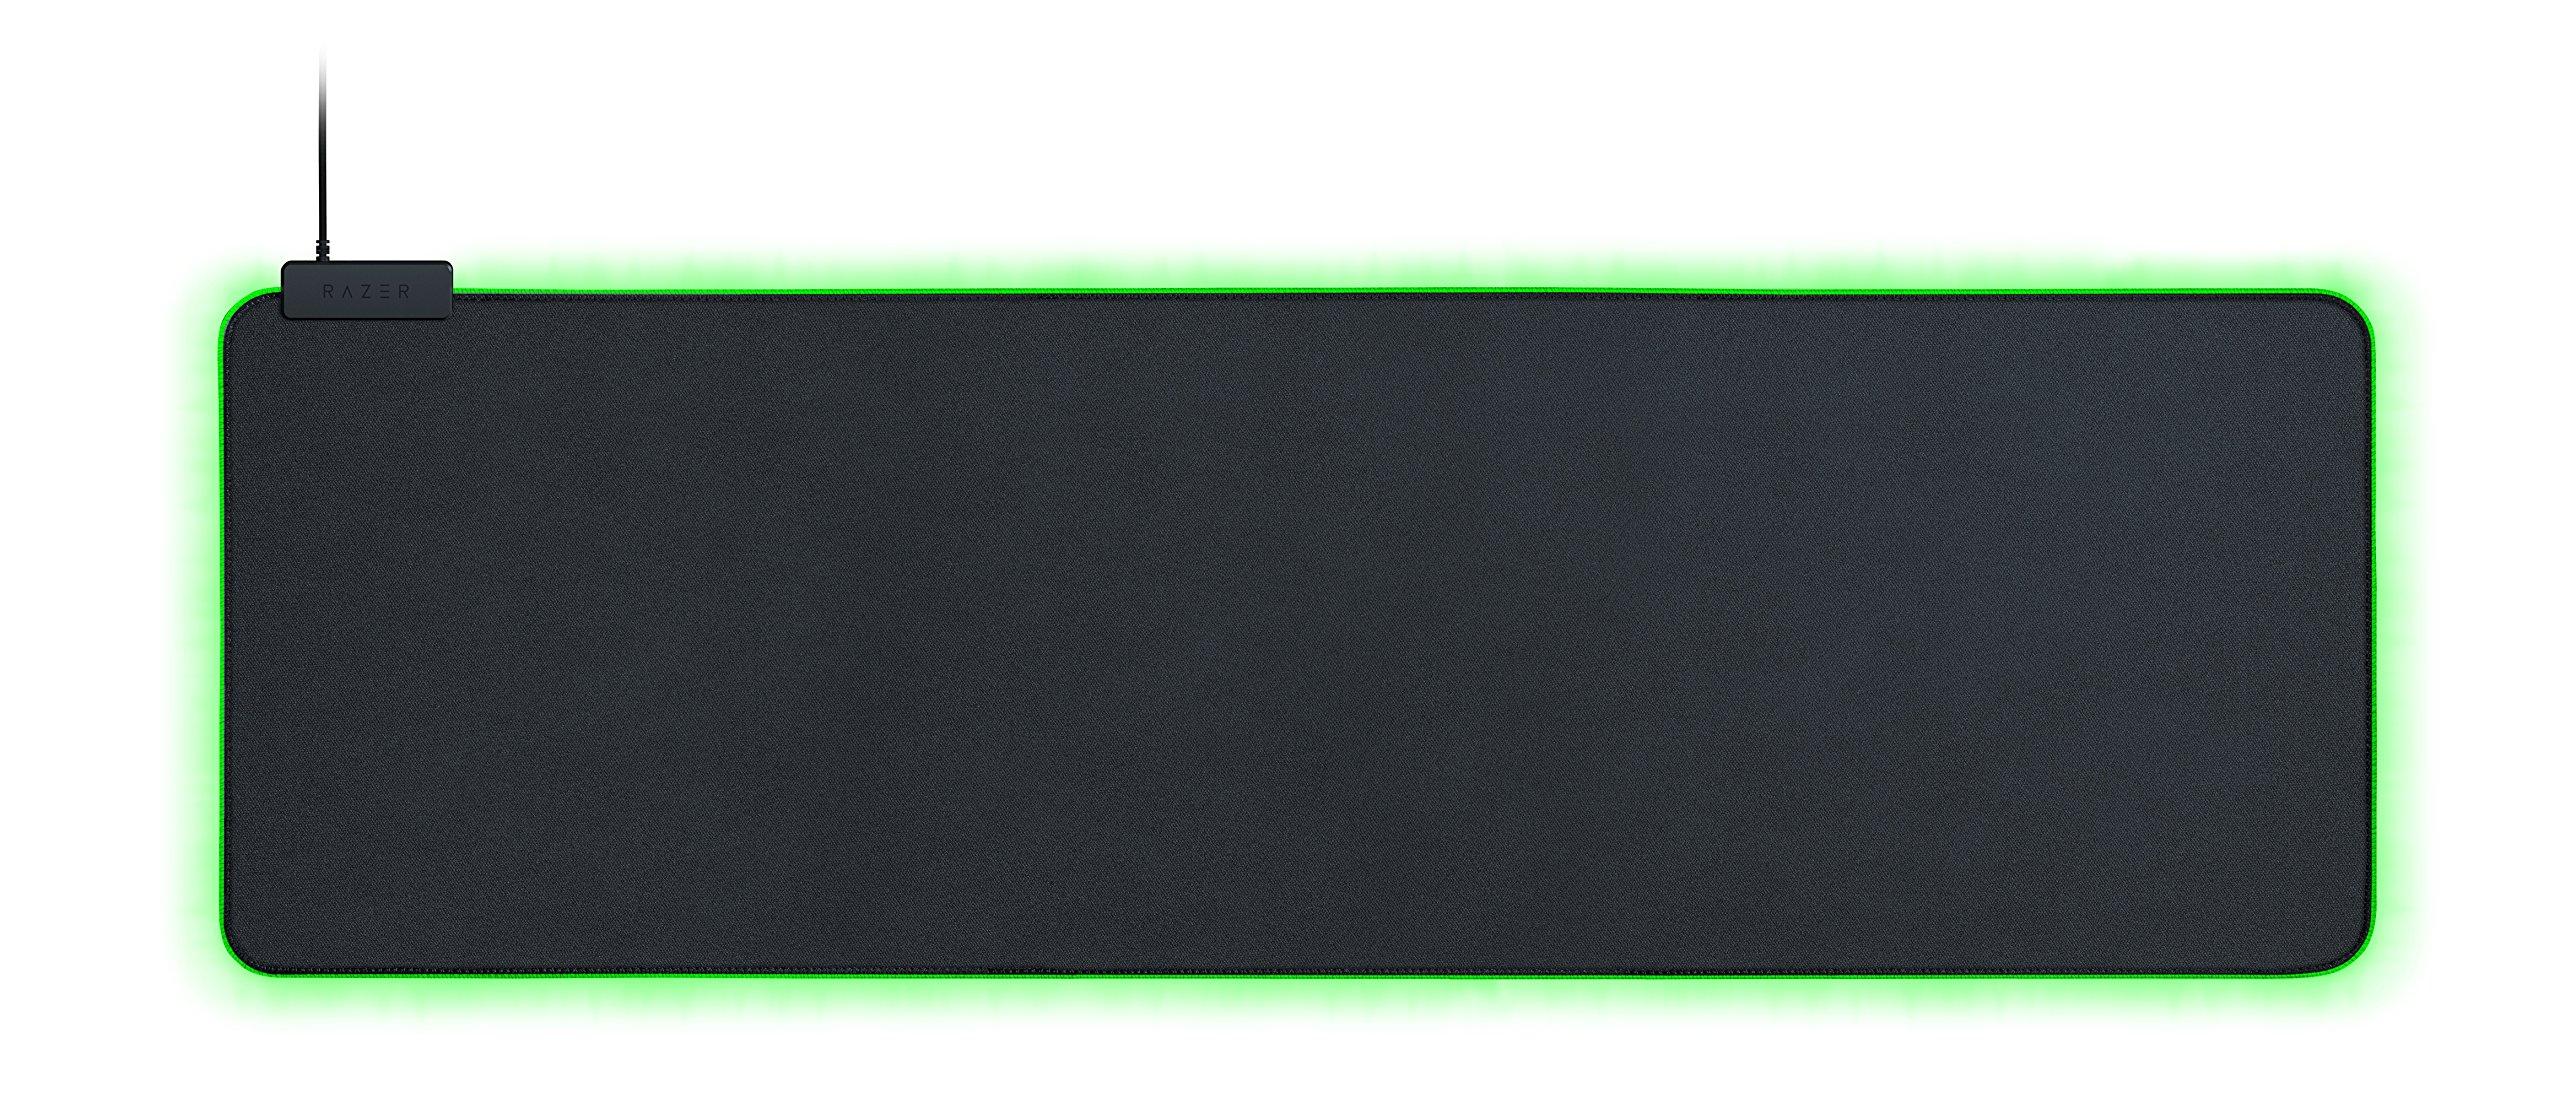 Razer Goliathus Extended Chroma Gaming Mousepad: Customizable Chroma RGB Lighting - Soft, Cloth Material - Balanced Control & Speed - Non-Slip Rubber Base - Matte Black by Razer